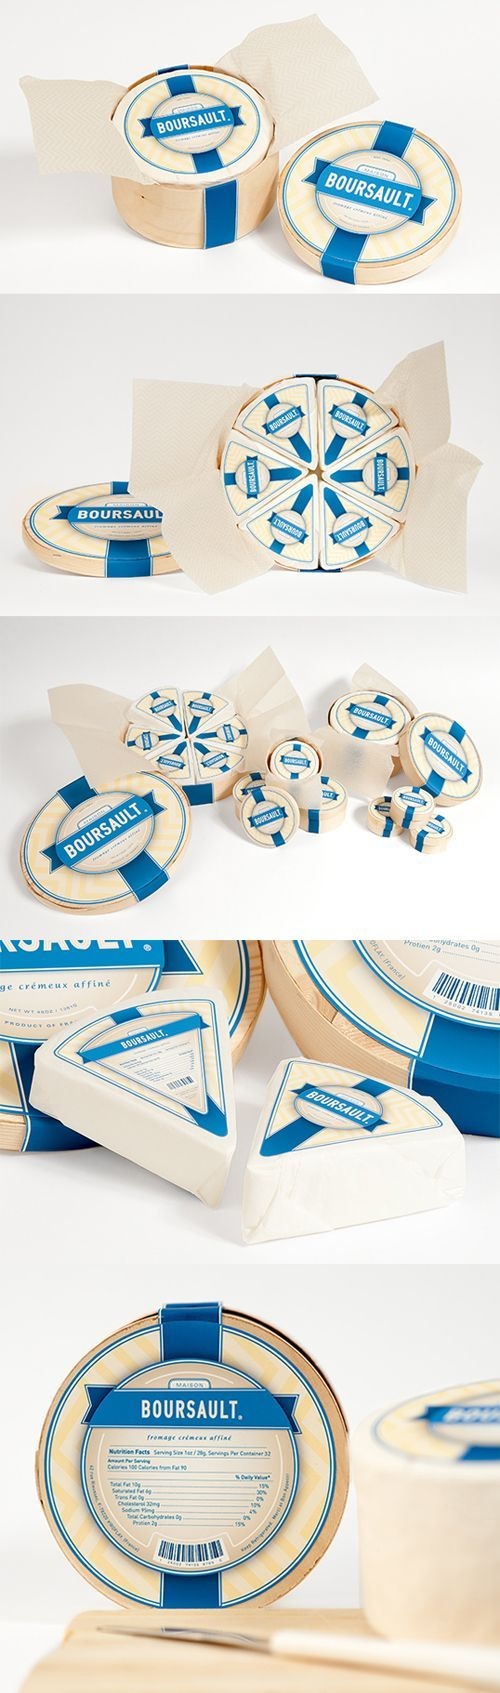 Best Packaging Design on the Internet, Boursault Cheese #packagindesign #packaging #design http://www.pinterest.com/aldenchong Uploaded by user